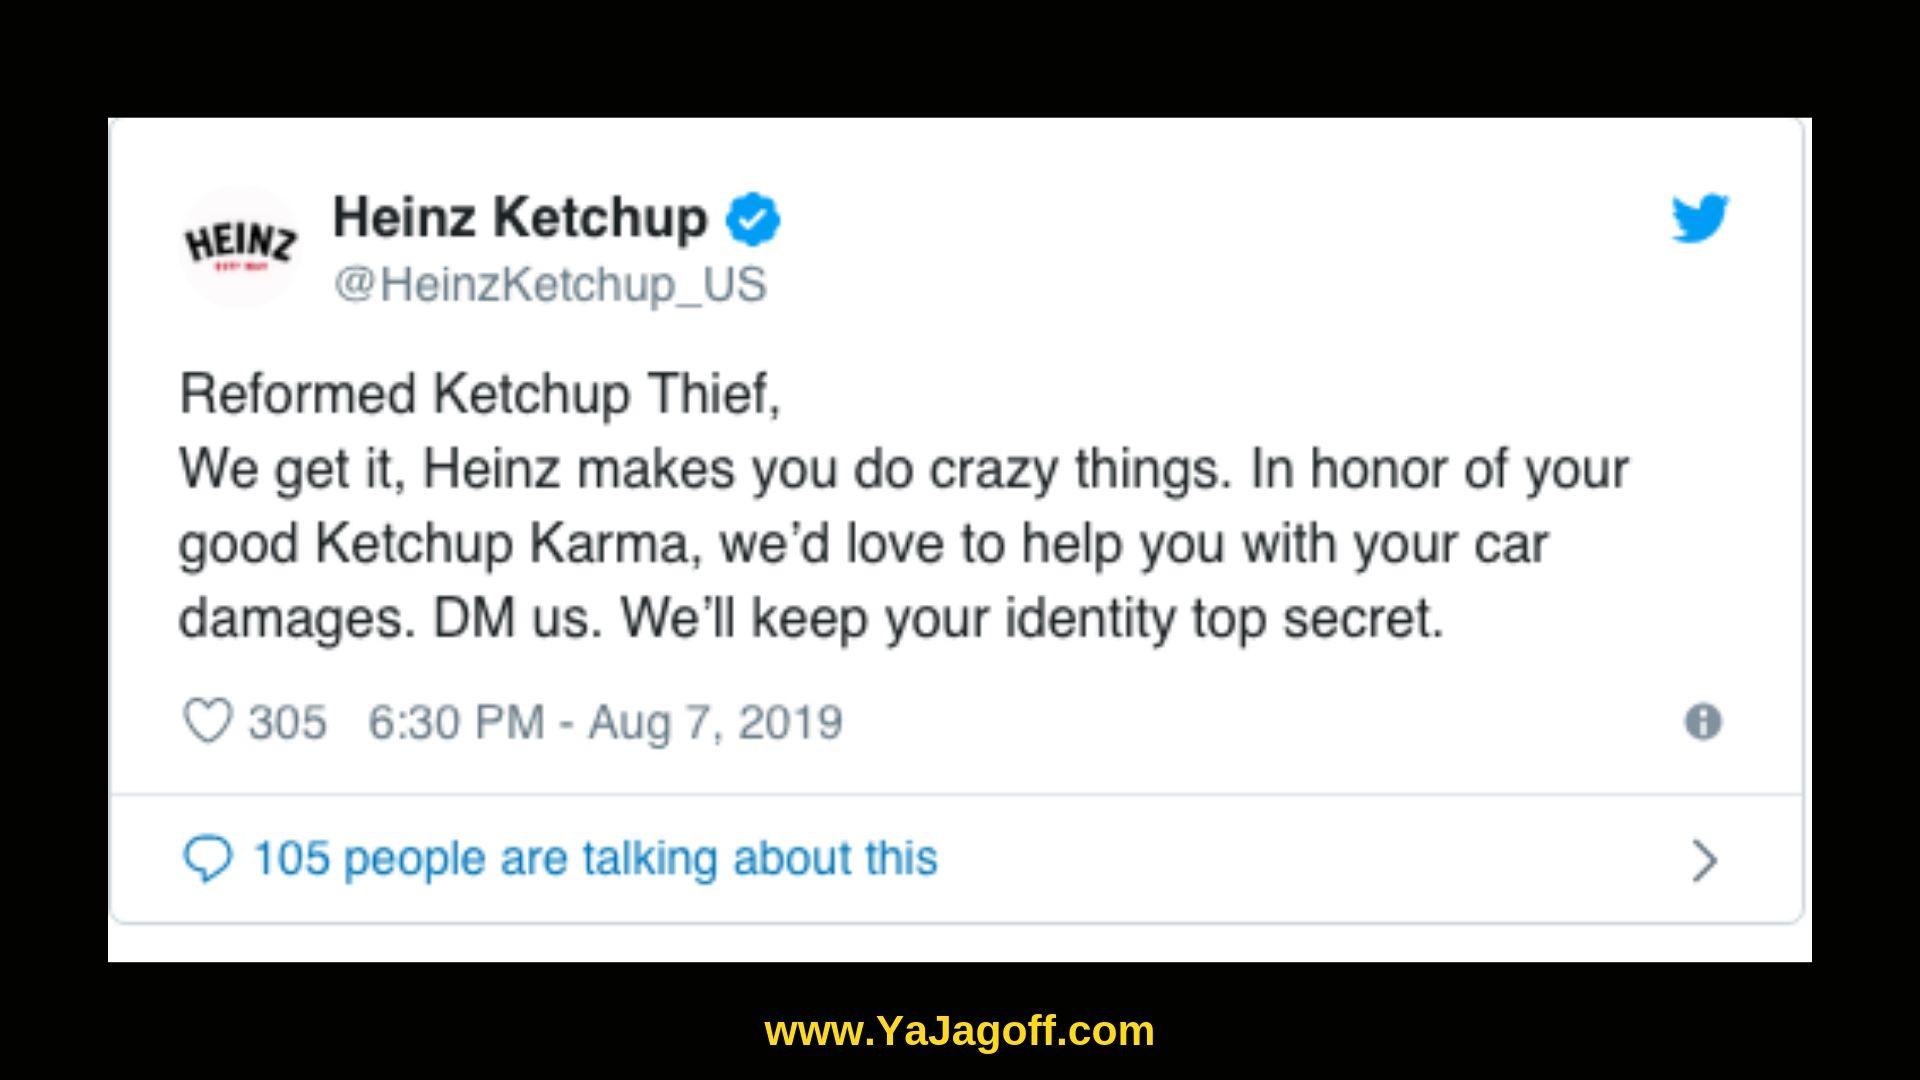 The YaJagoff Podcast Heinz Ketchup